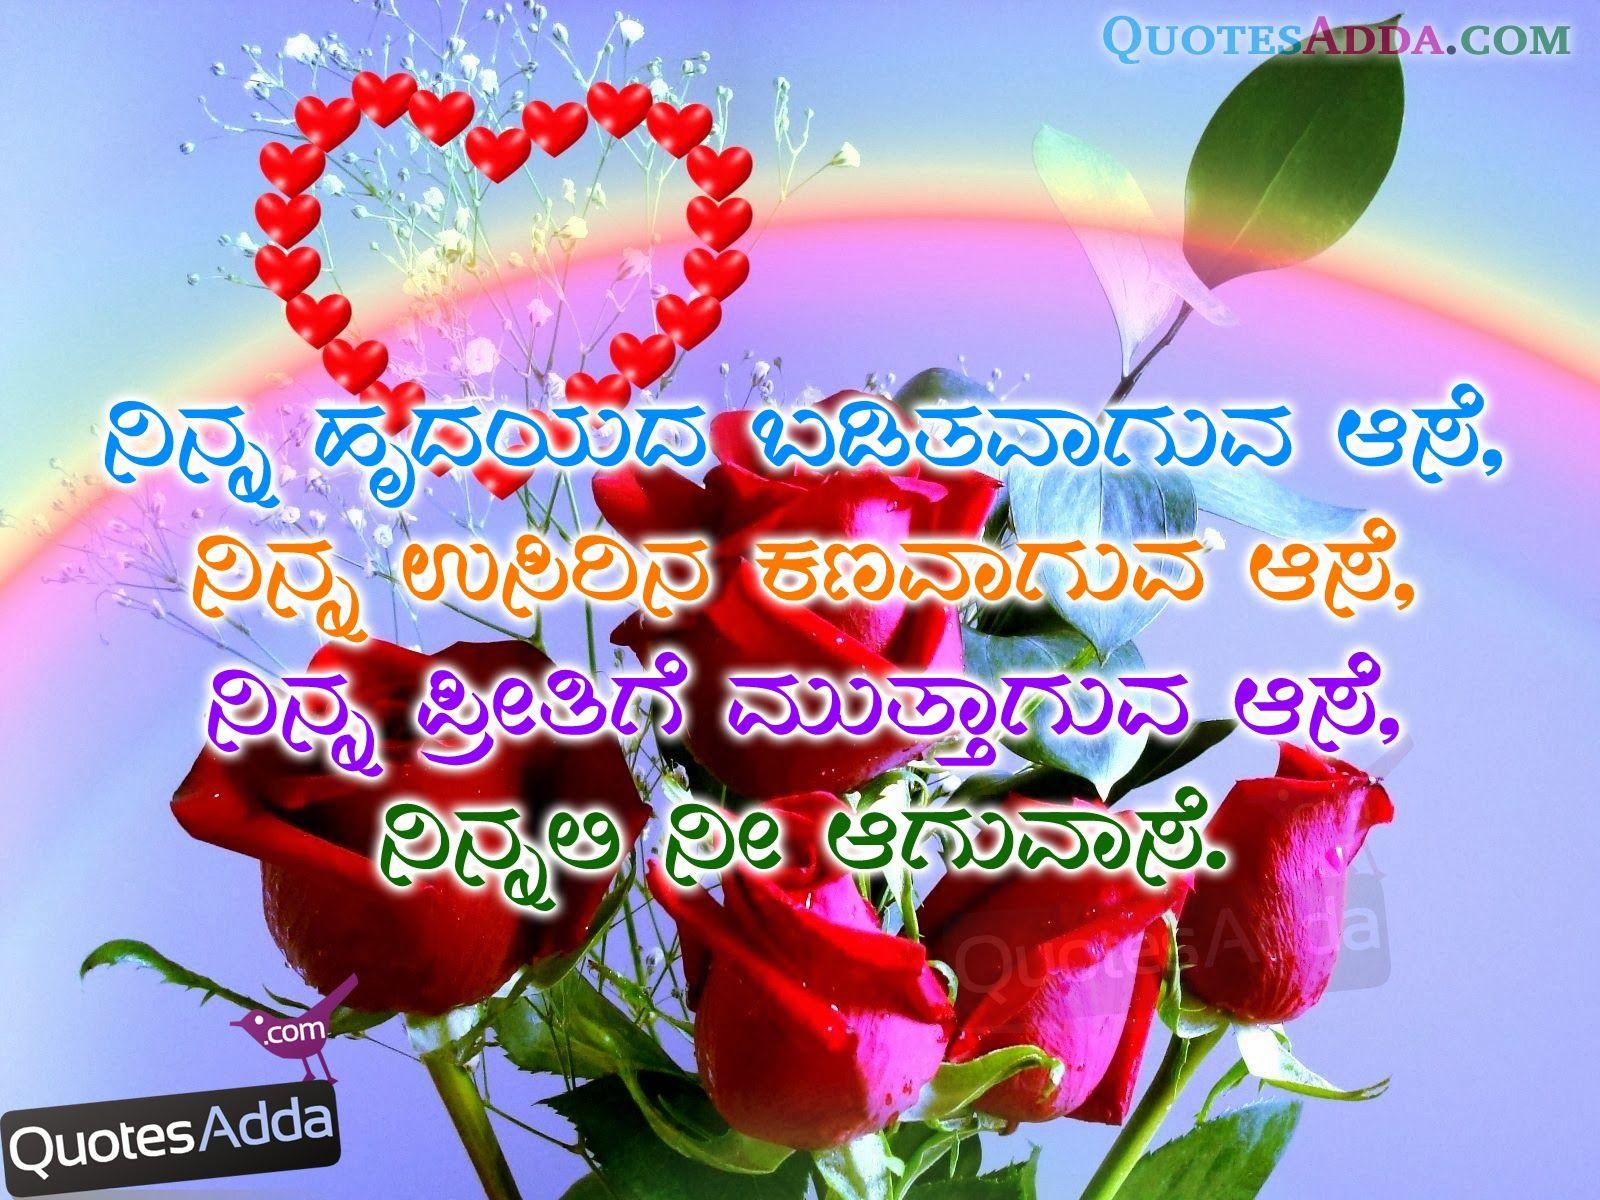 Kannada Quotes, Kannada Love Quotes, Kannada Kavanagalu